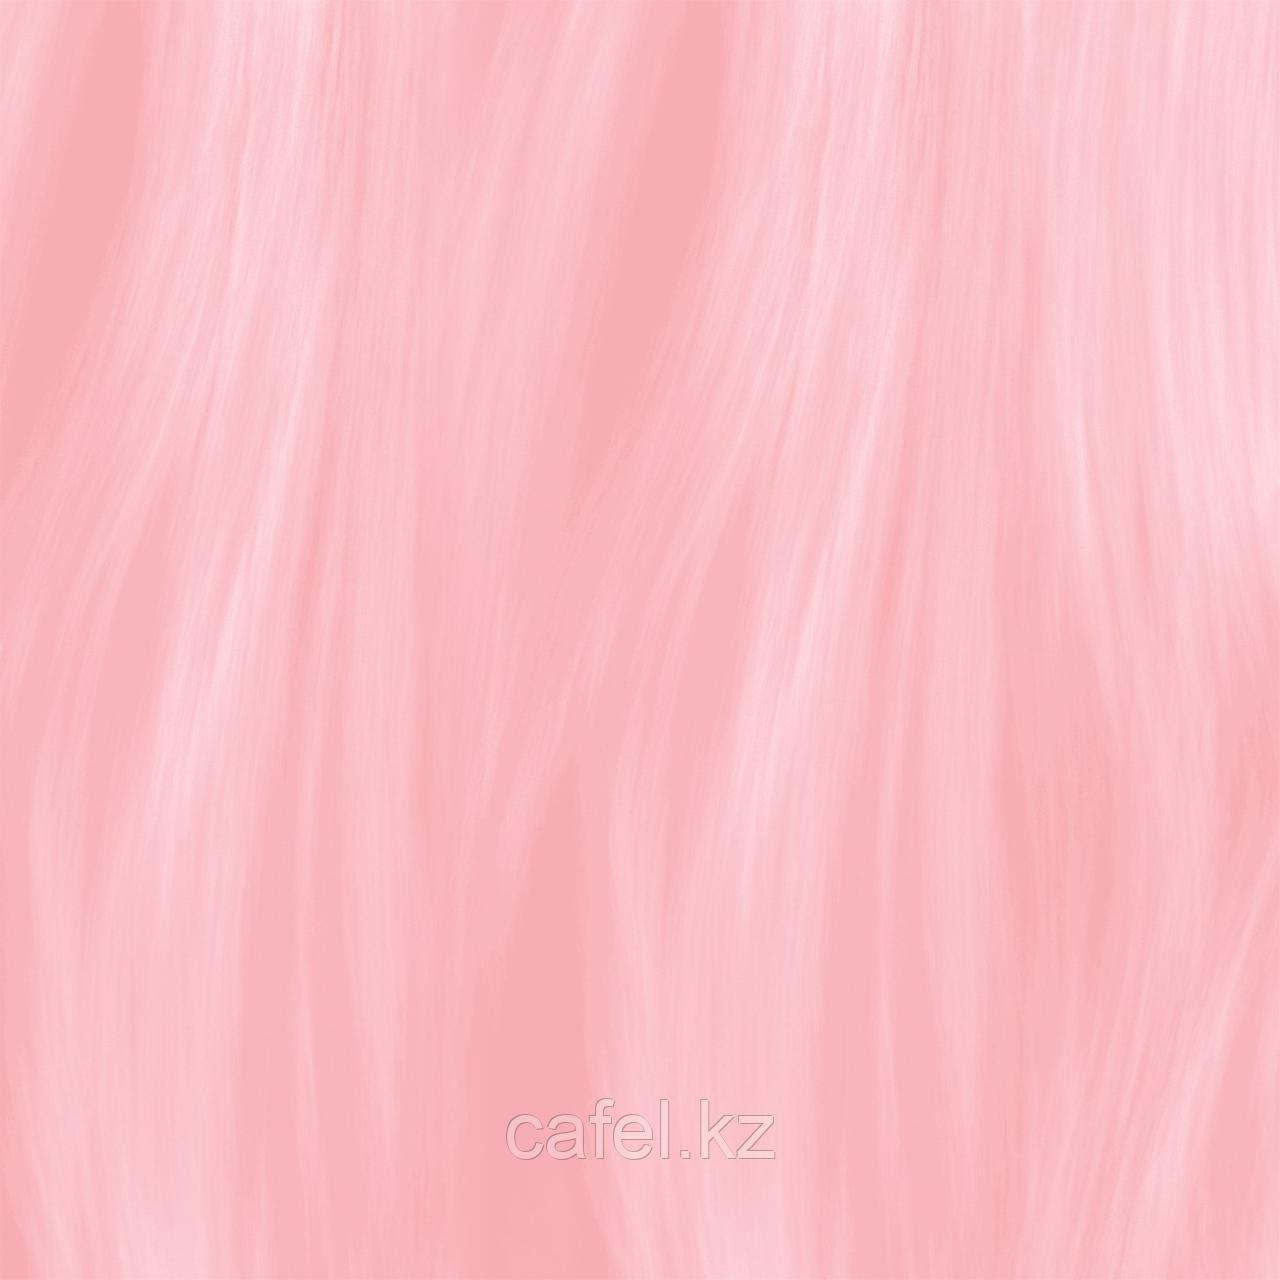 Кафель | Плитка для пола 33х33 Агата | Agata розовый